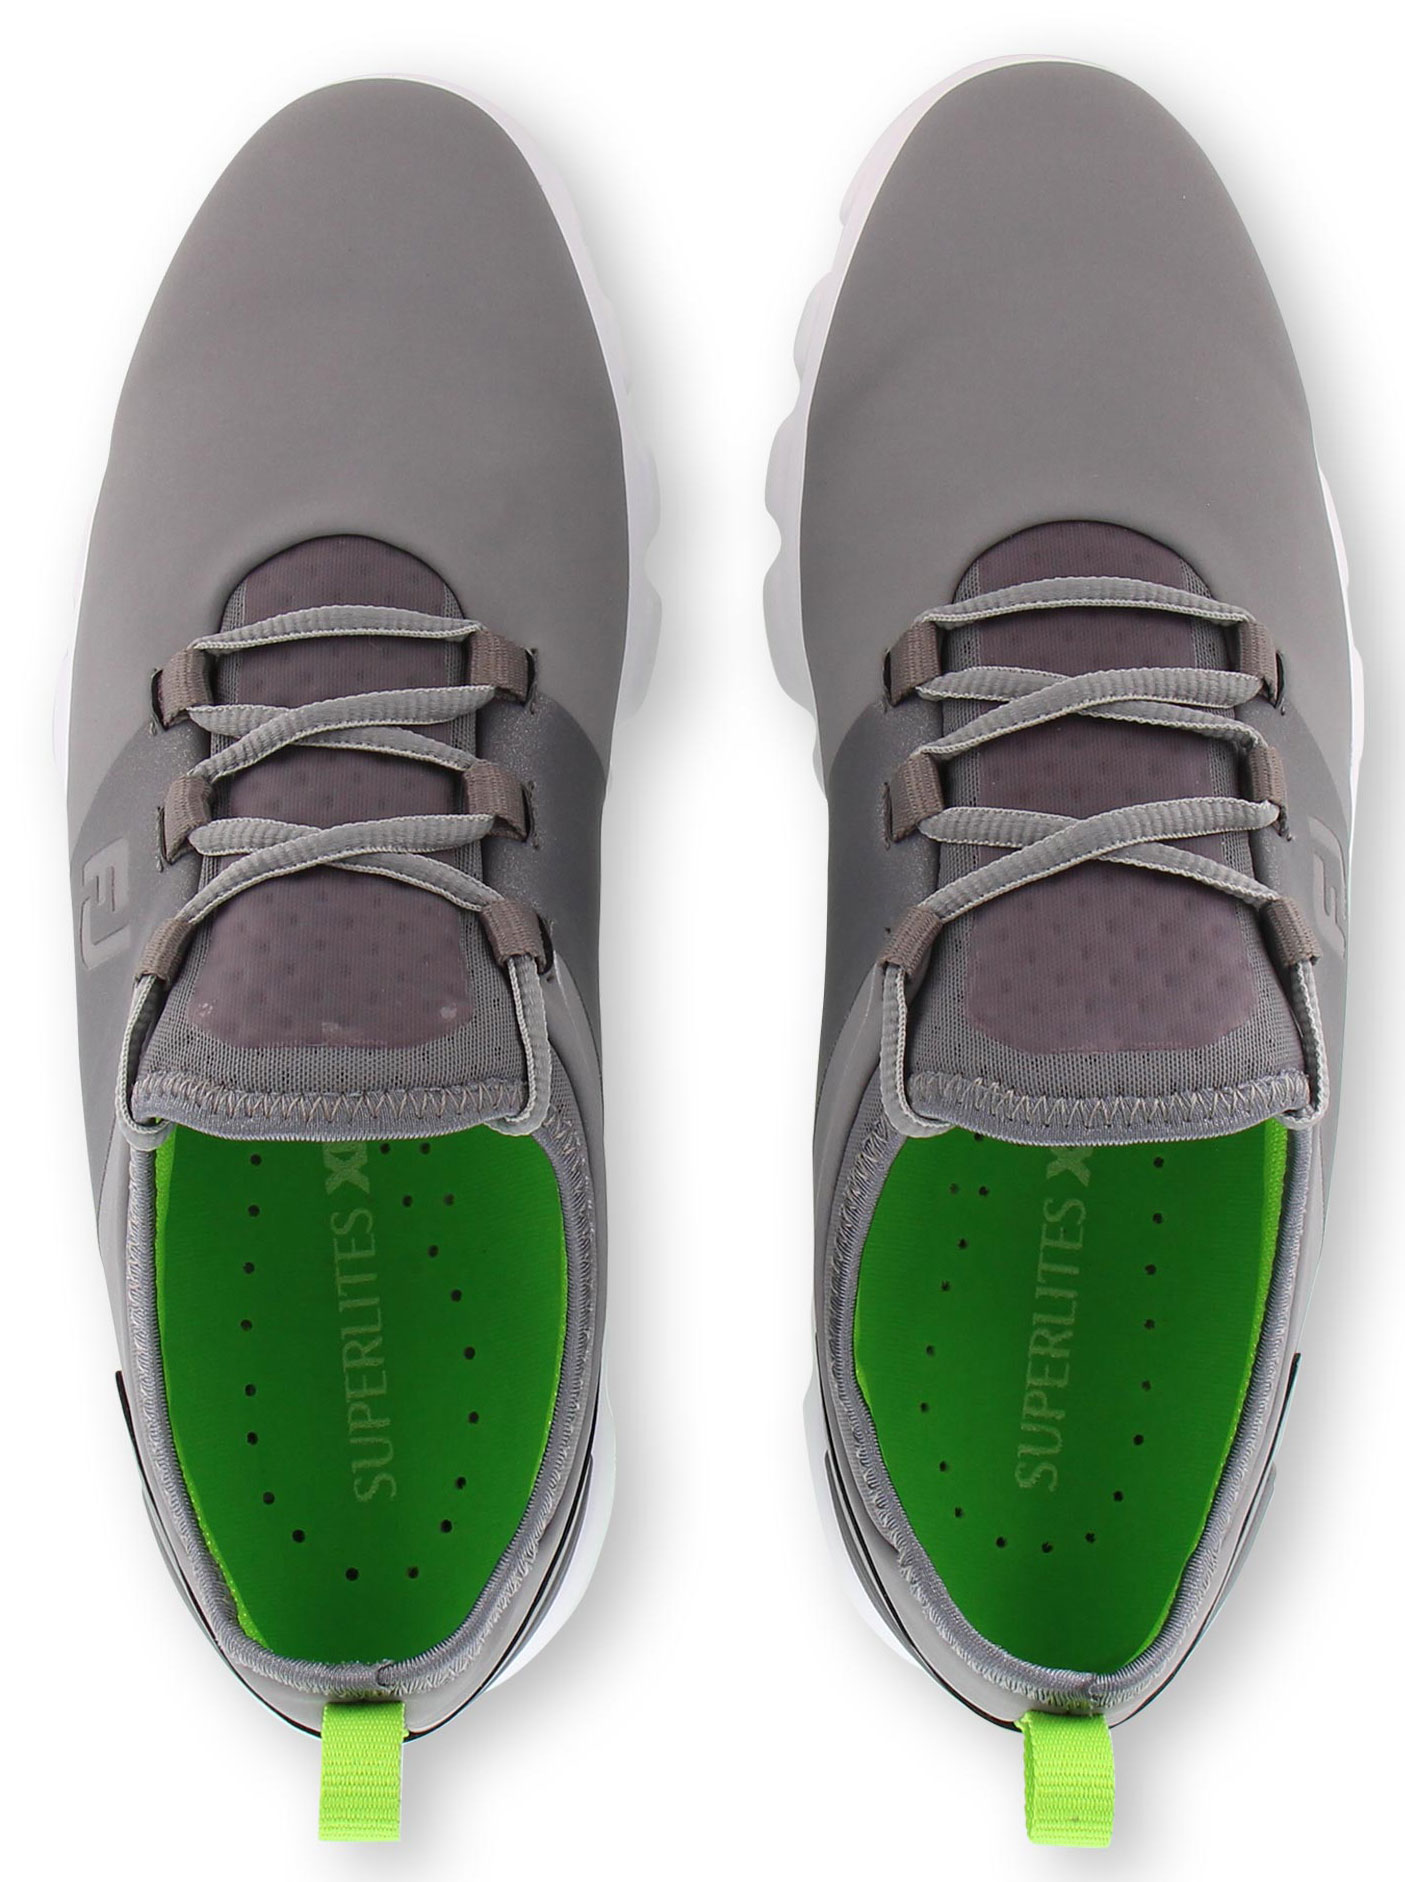 FootJoy-Superlites-XP-Golf-Shoes-Men-039-s-New thumbnail 9